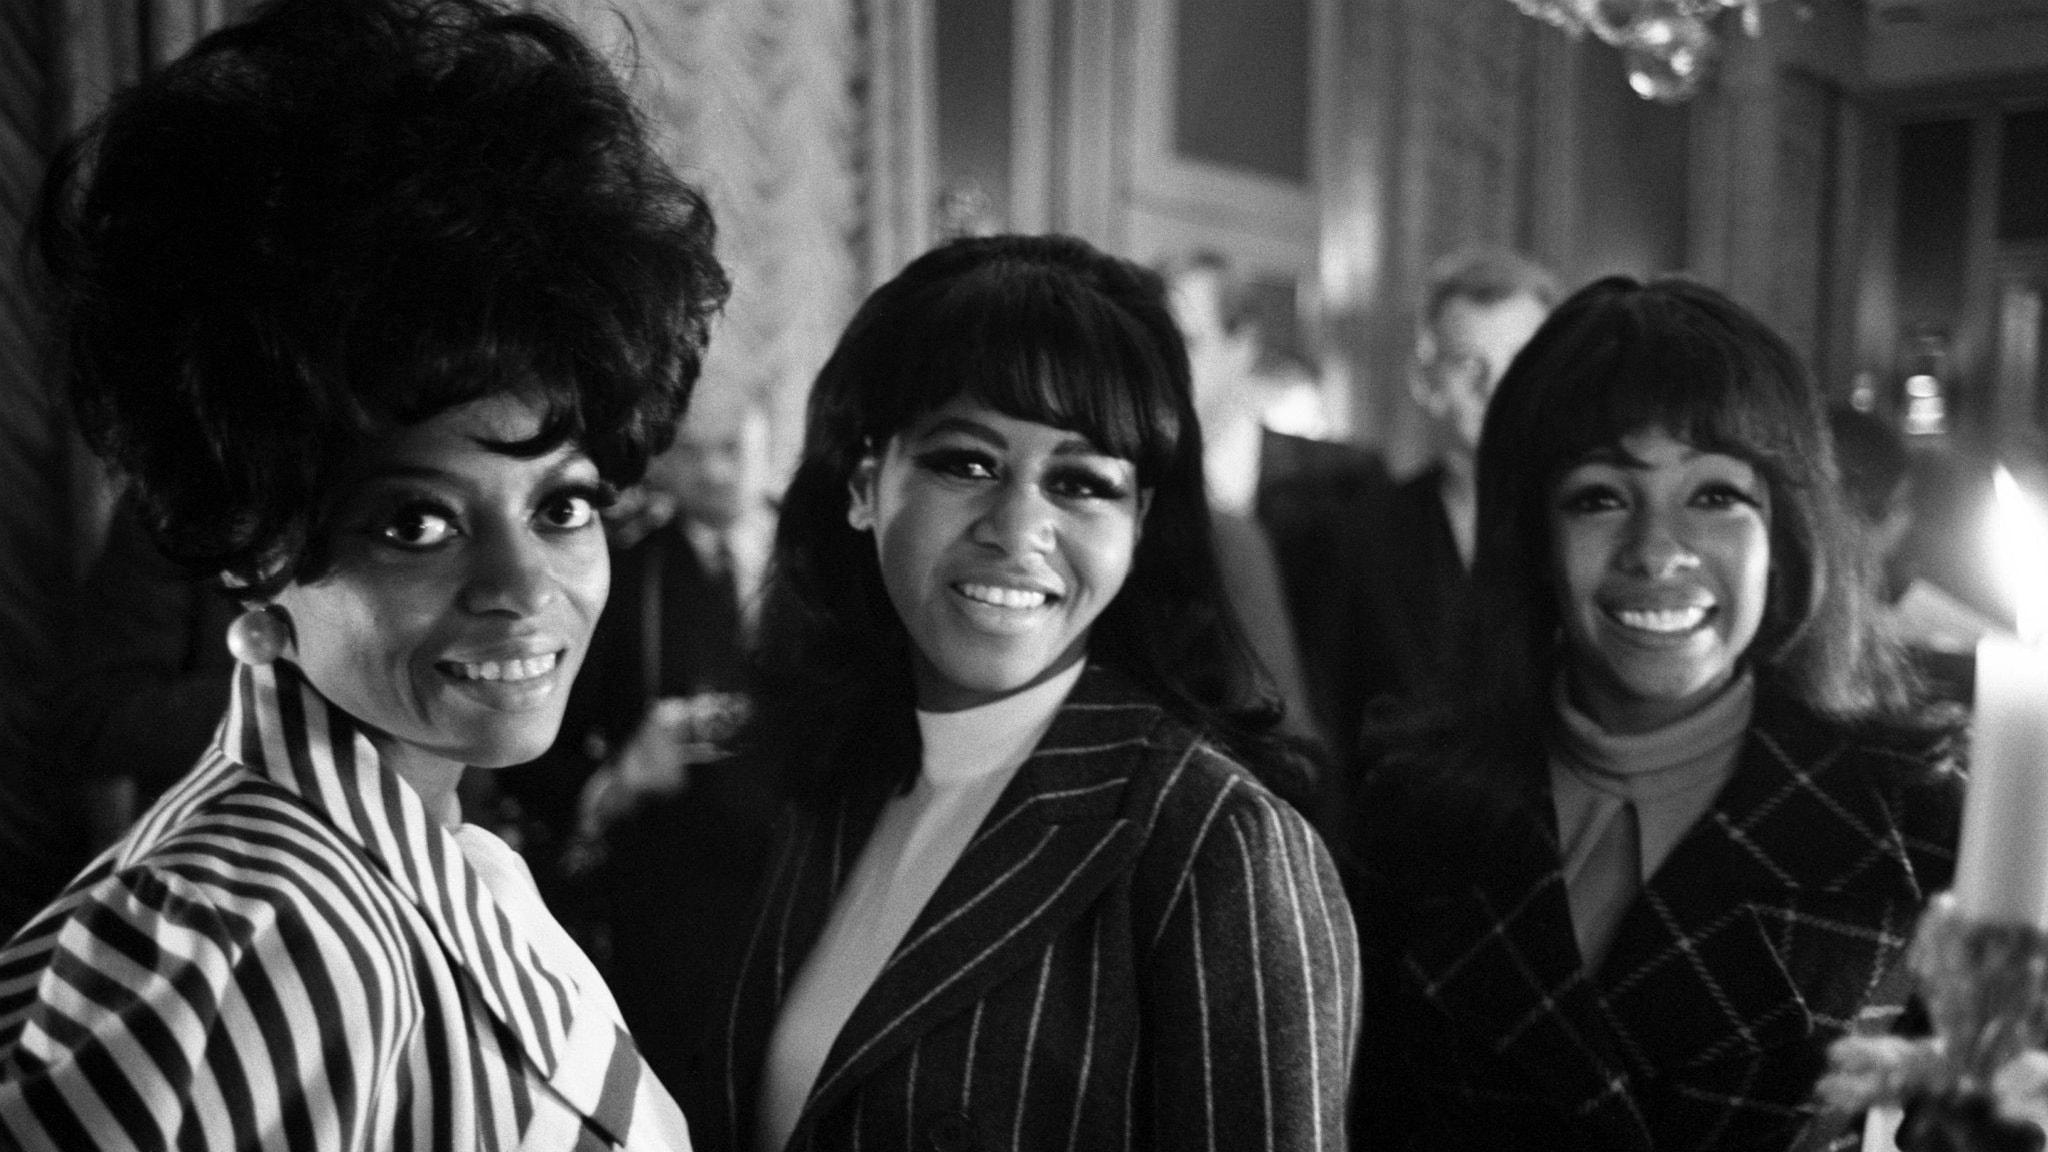 The Supremes hörs bland utmanarna i Tio i Topp 14 november 1964